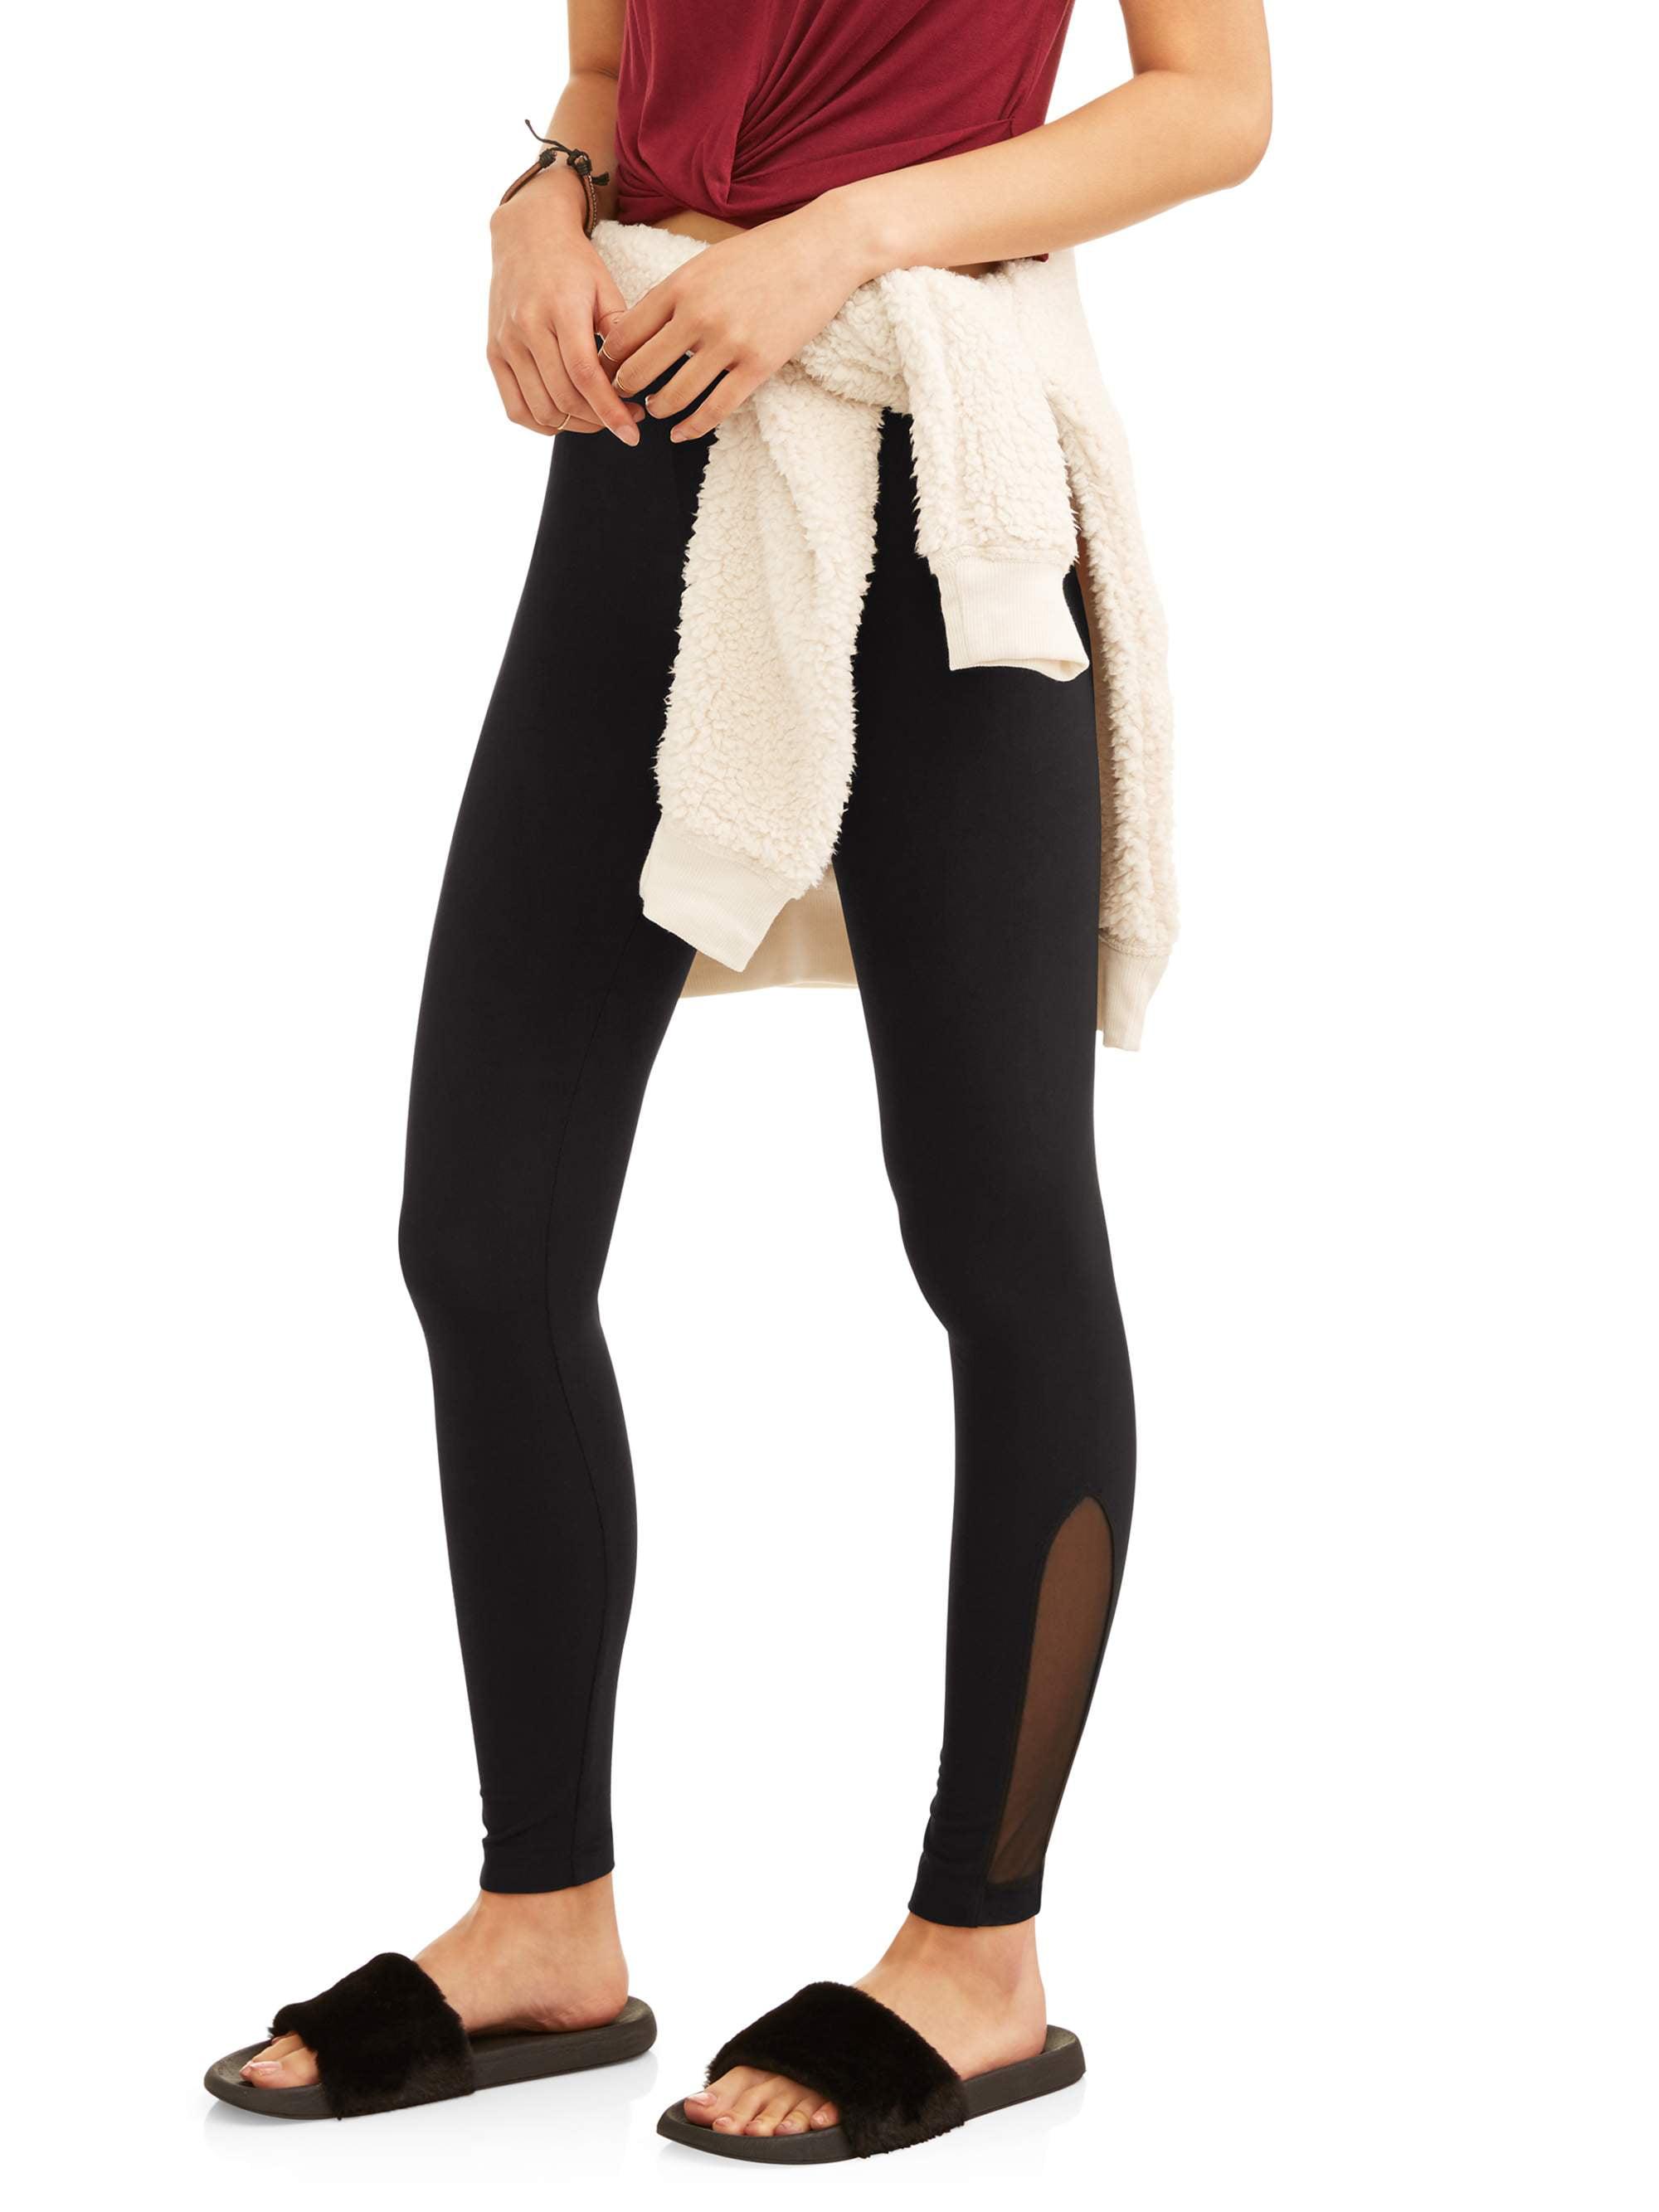 8384ab8772c713 Check Inventory. Juniors' Fashion Side Mesh Ankle Leggings (Prints ...